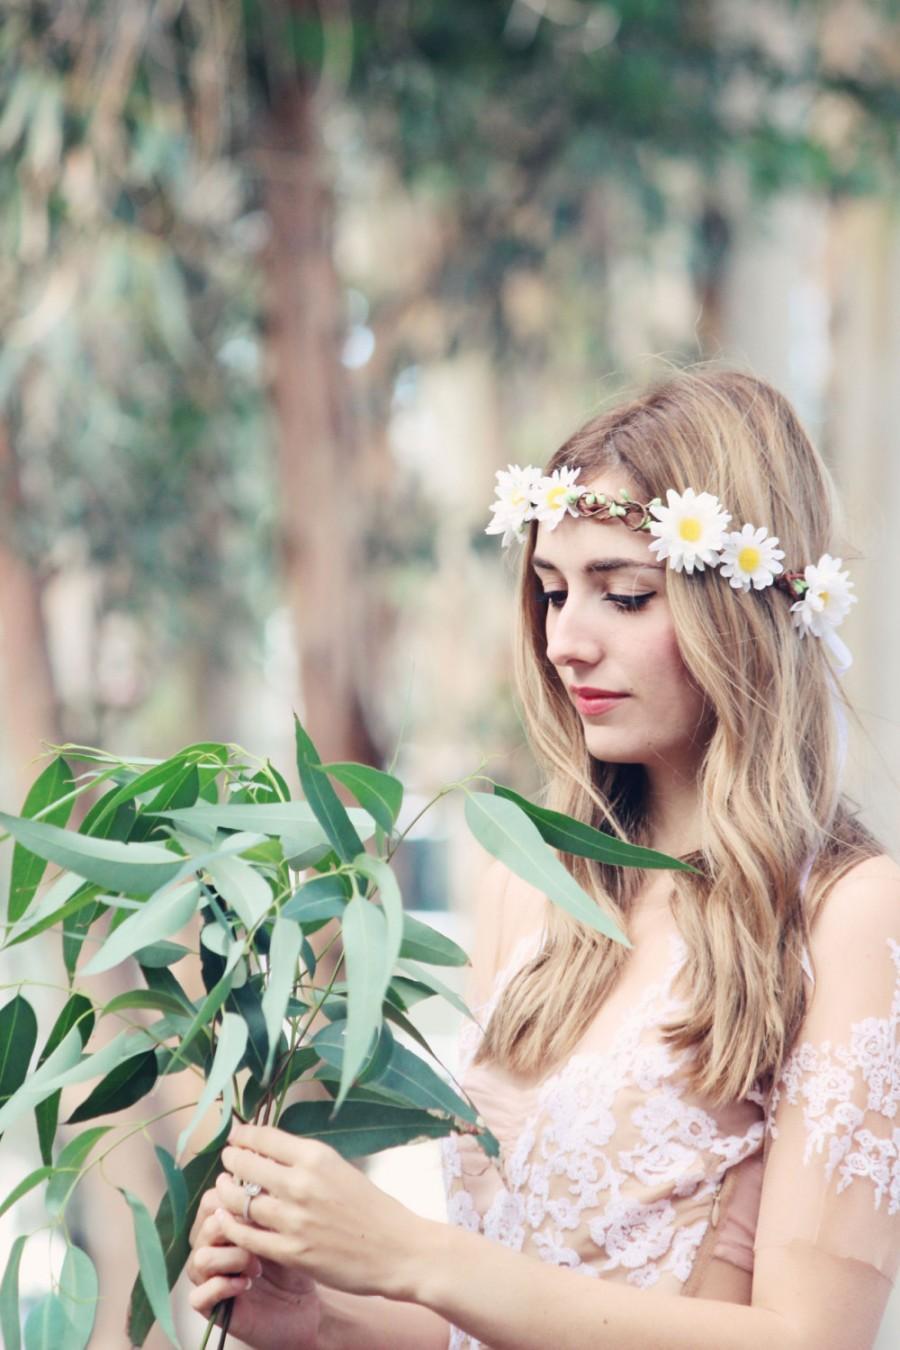 Daisy Wedding Flower Bridal Hair Accessory White Hair Wreath Silk